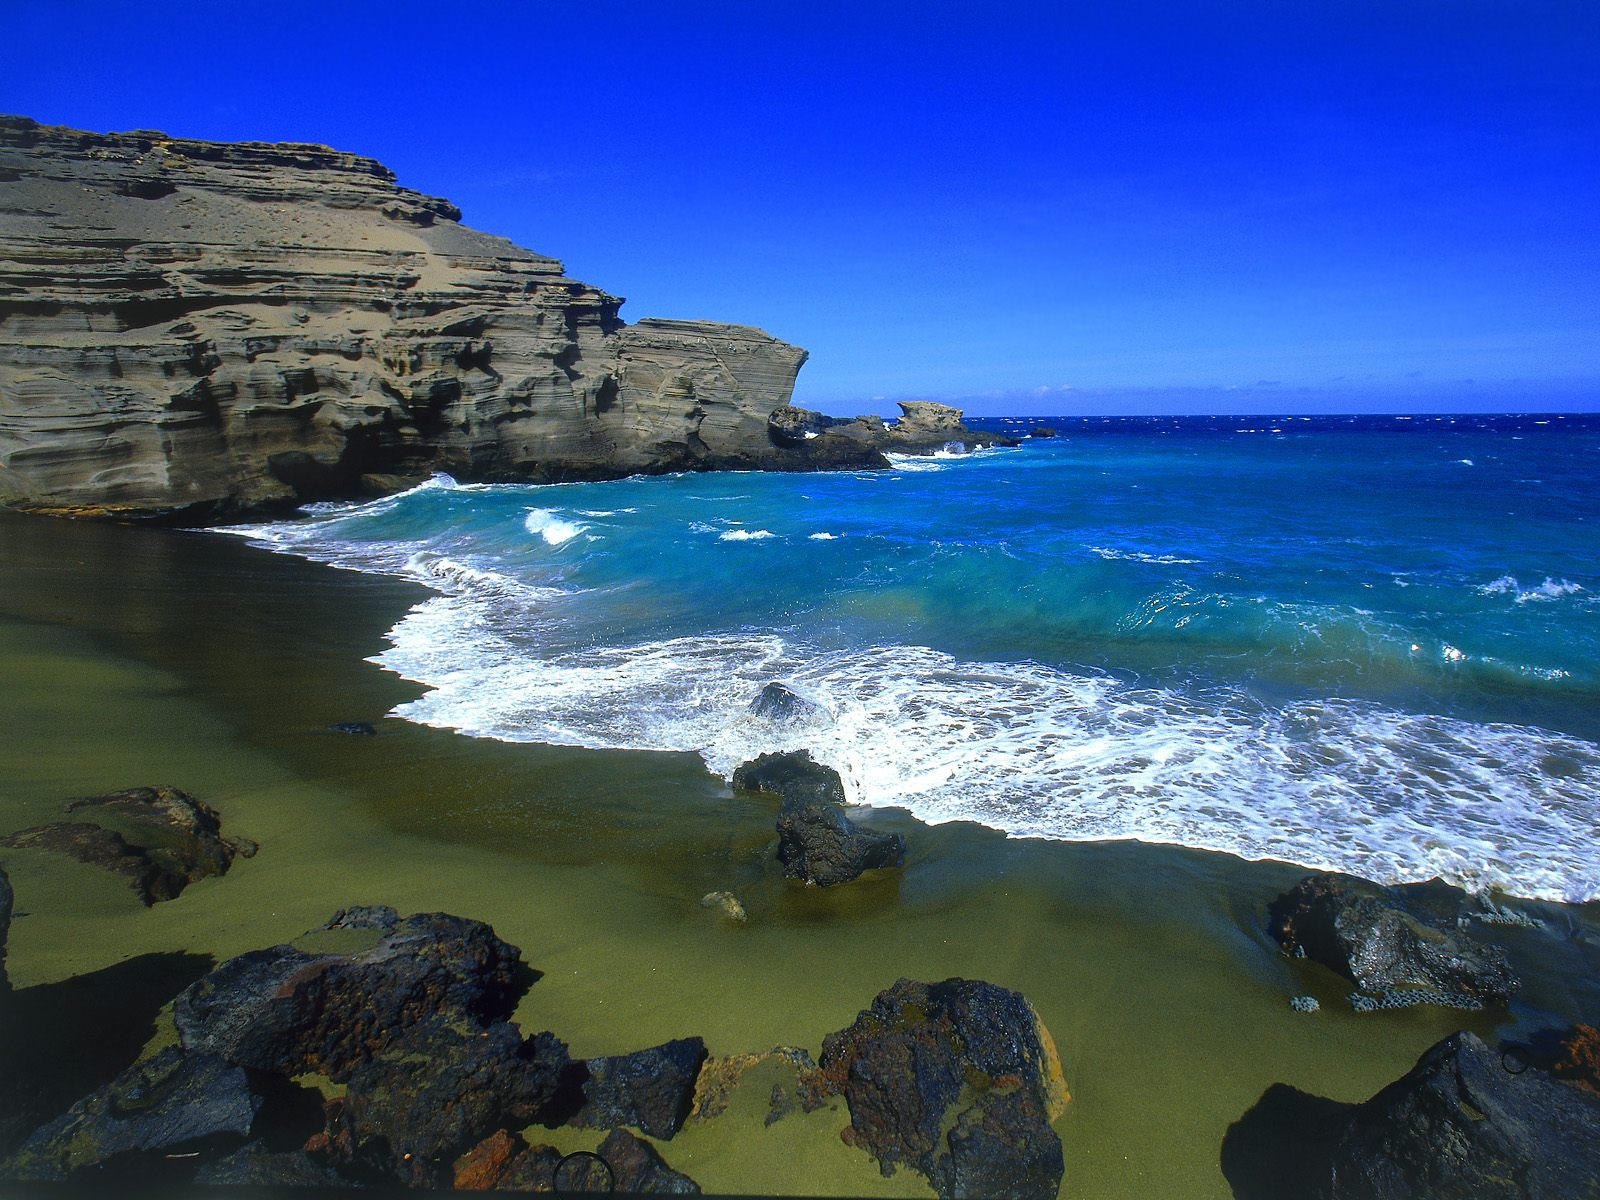 green beach big island wallpapers - Green Beach Big Island Wallpaper Free HD Wallpapers for